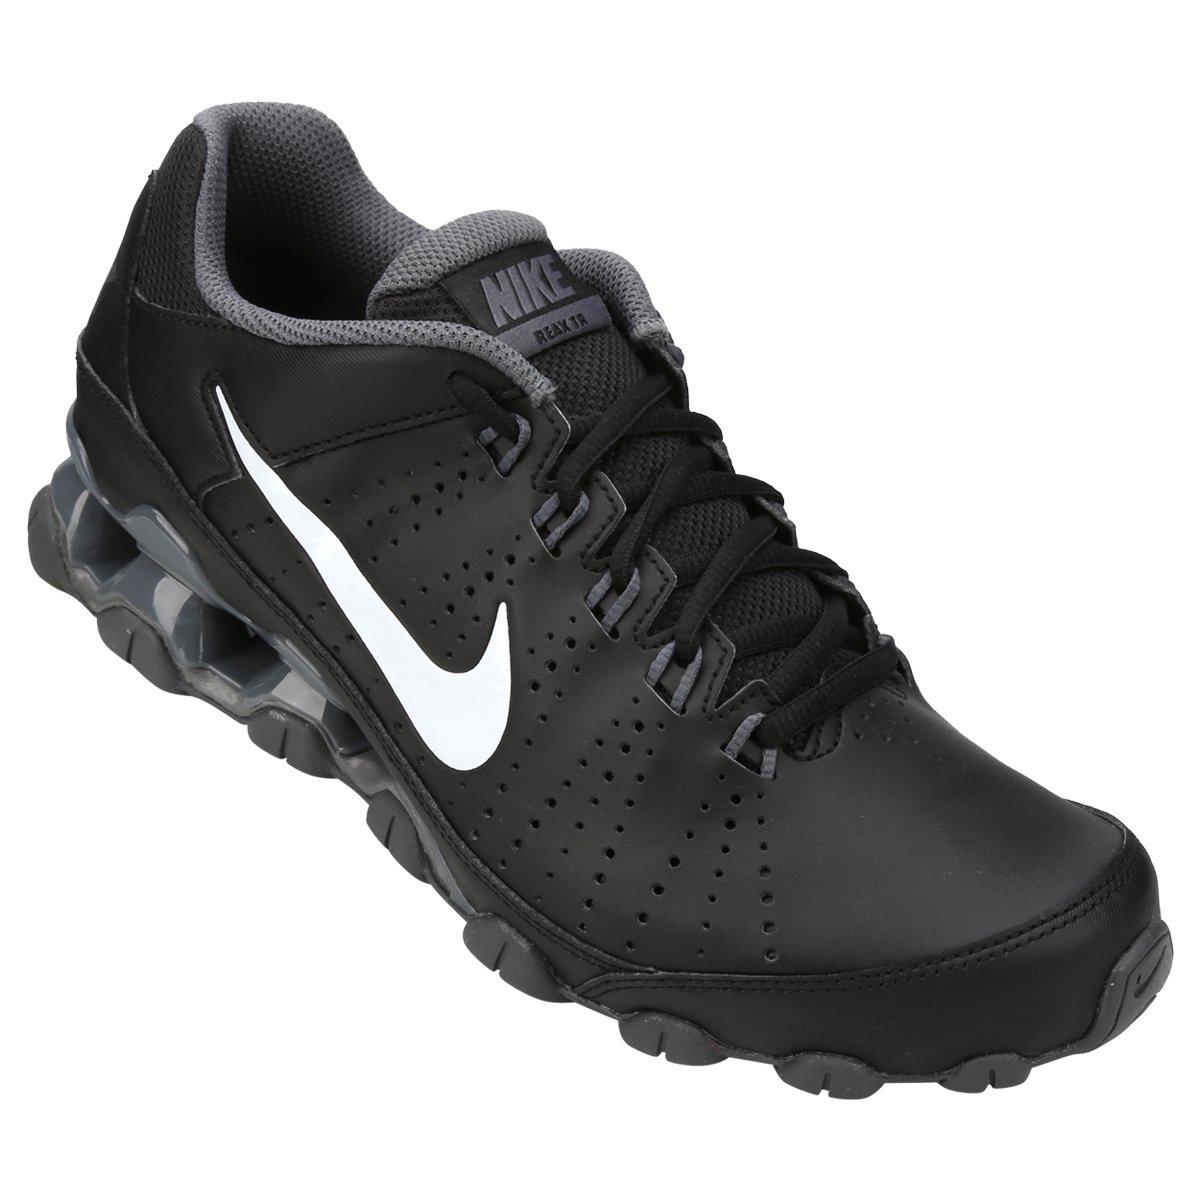 Tênis Nike Reax 9 Tr Sl Masculino - Compre Agora  82293da5f6714